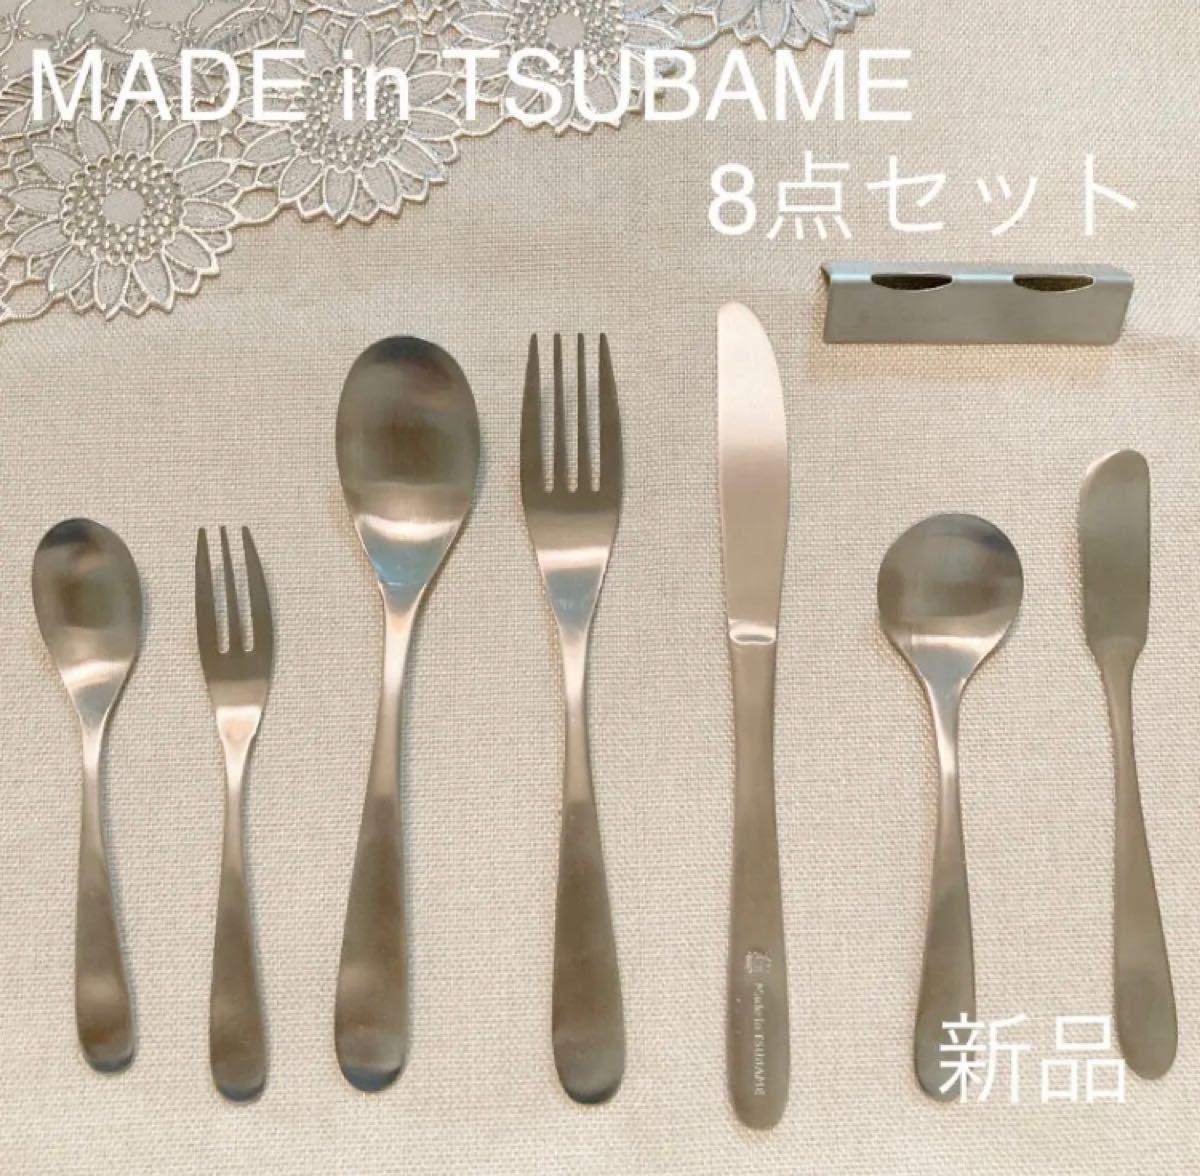 MADE in TSUBAME カトラリーセット 8種 新品 日本製 新潟県燕市燕三条 スプーン ナイフ フォーク